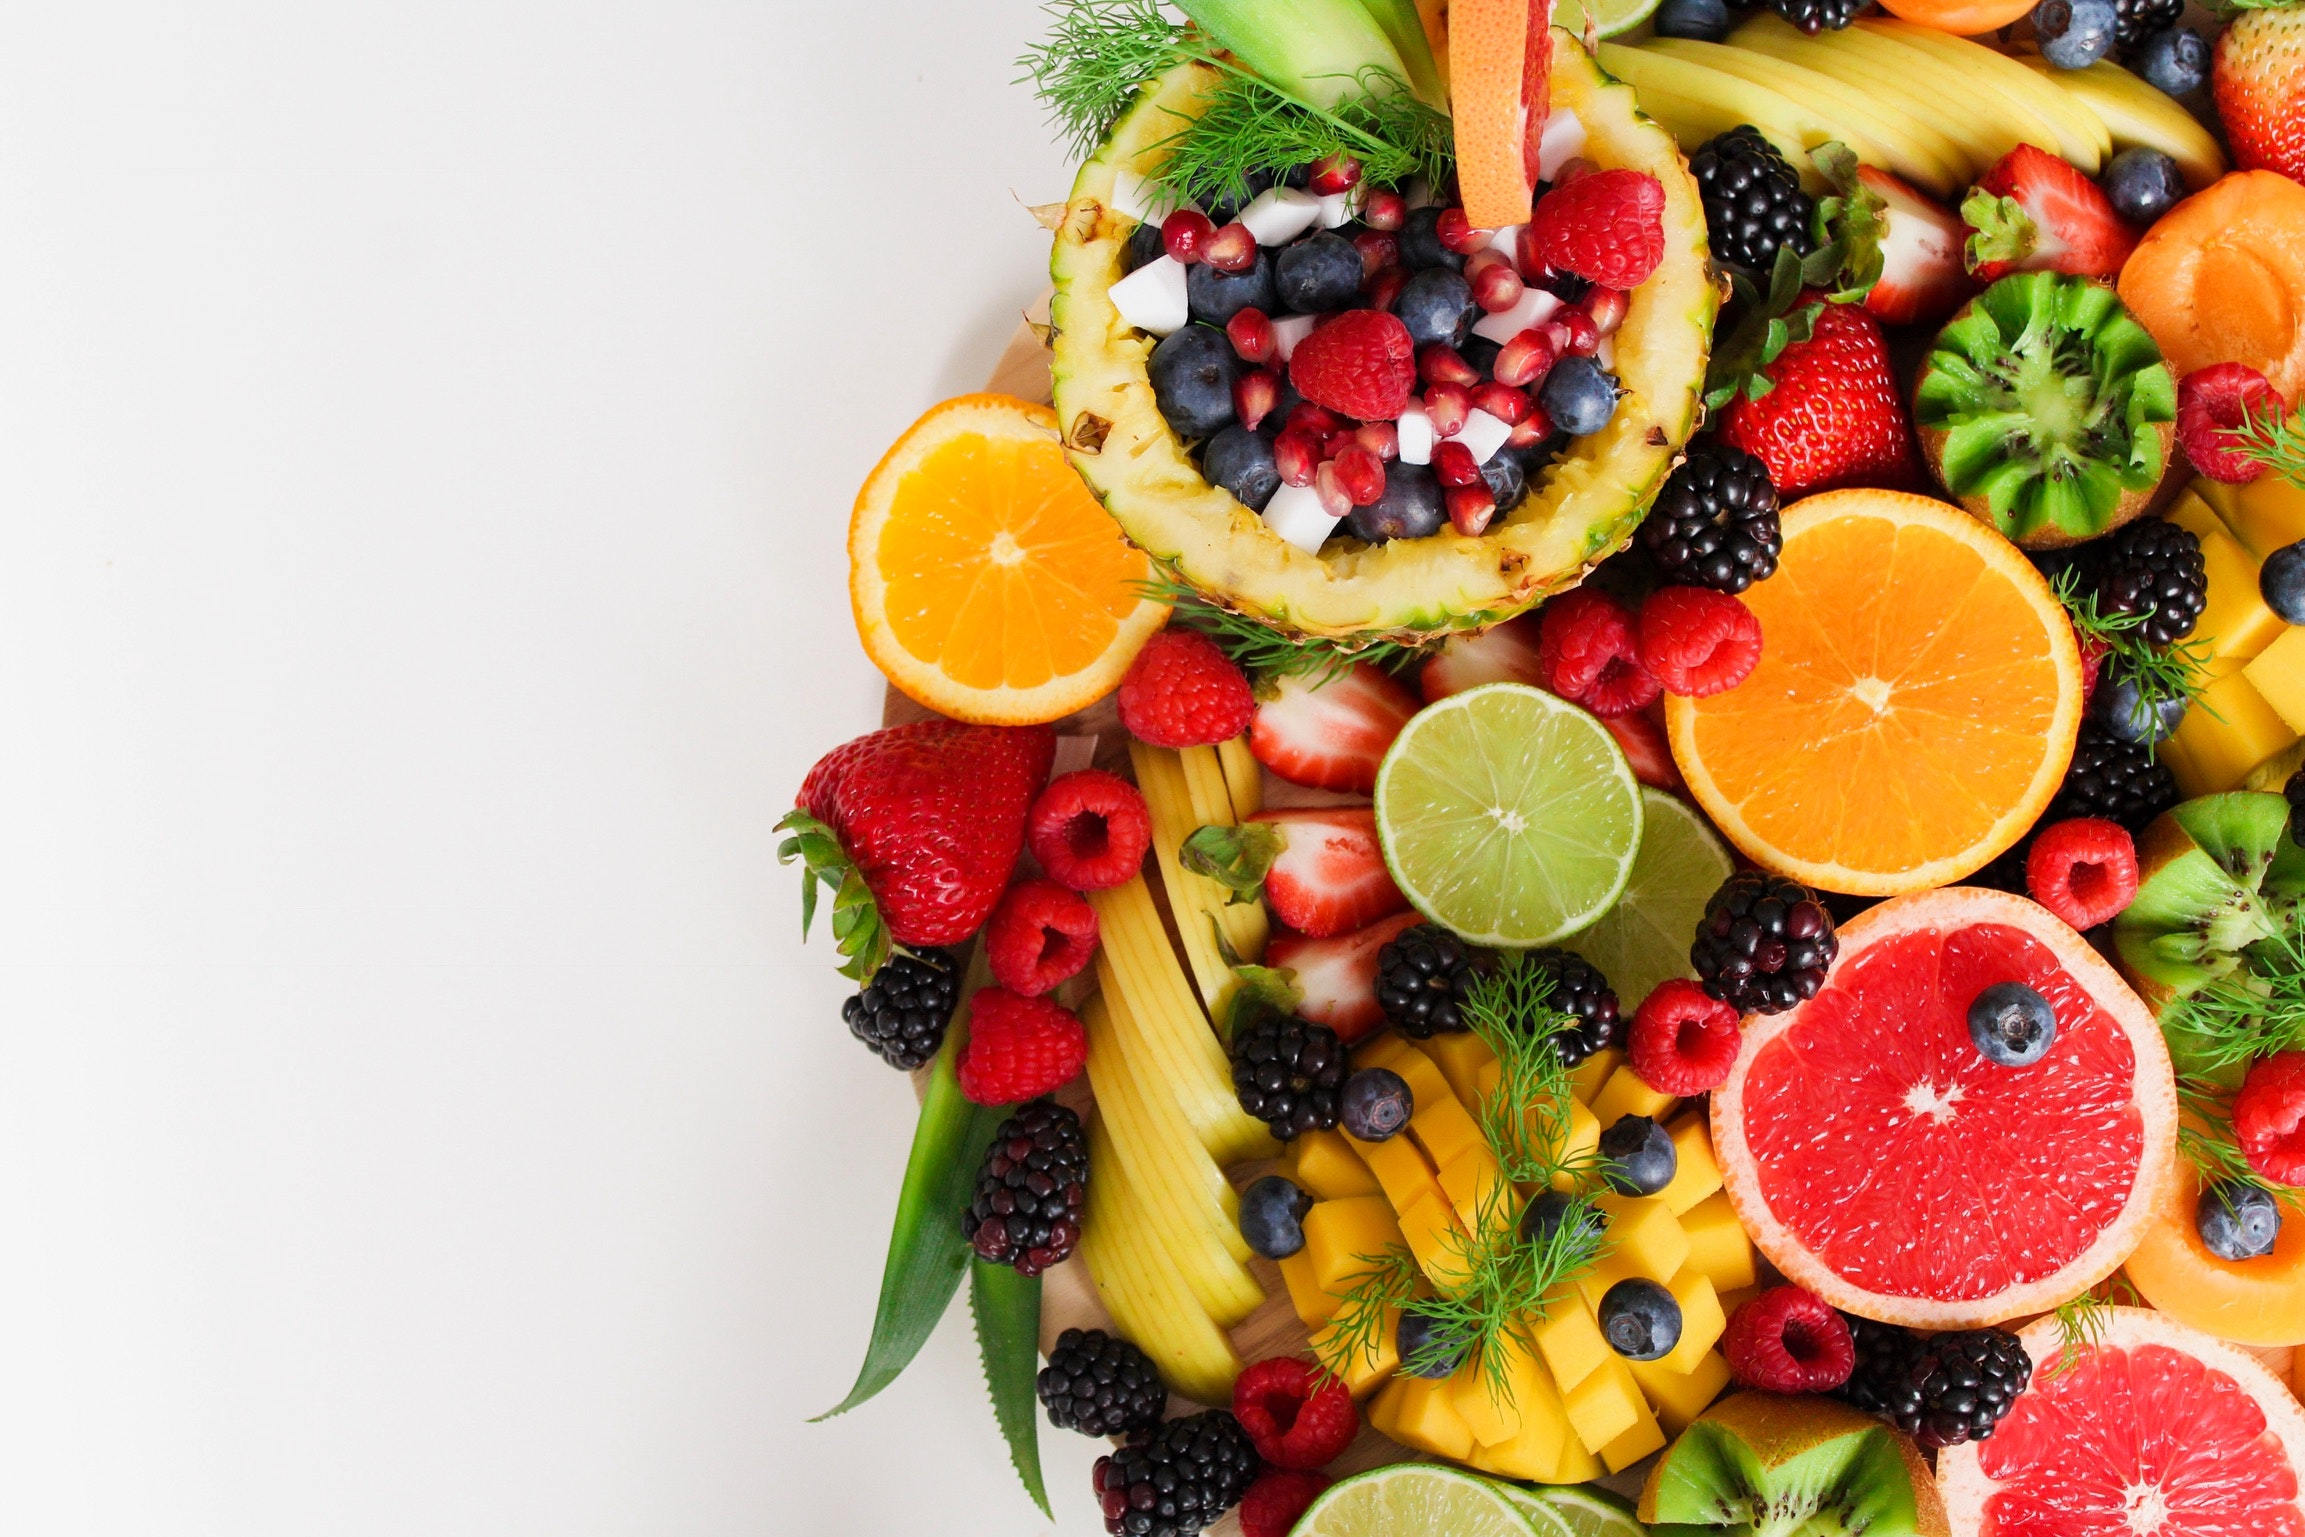 Superfood Kraftpaket der Natur?